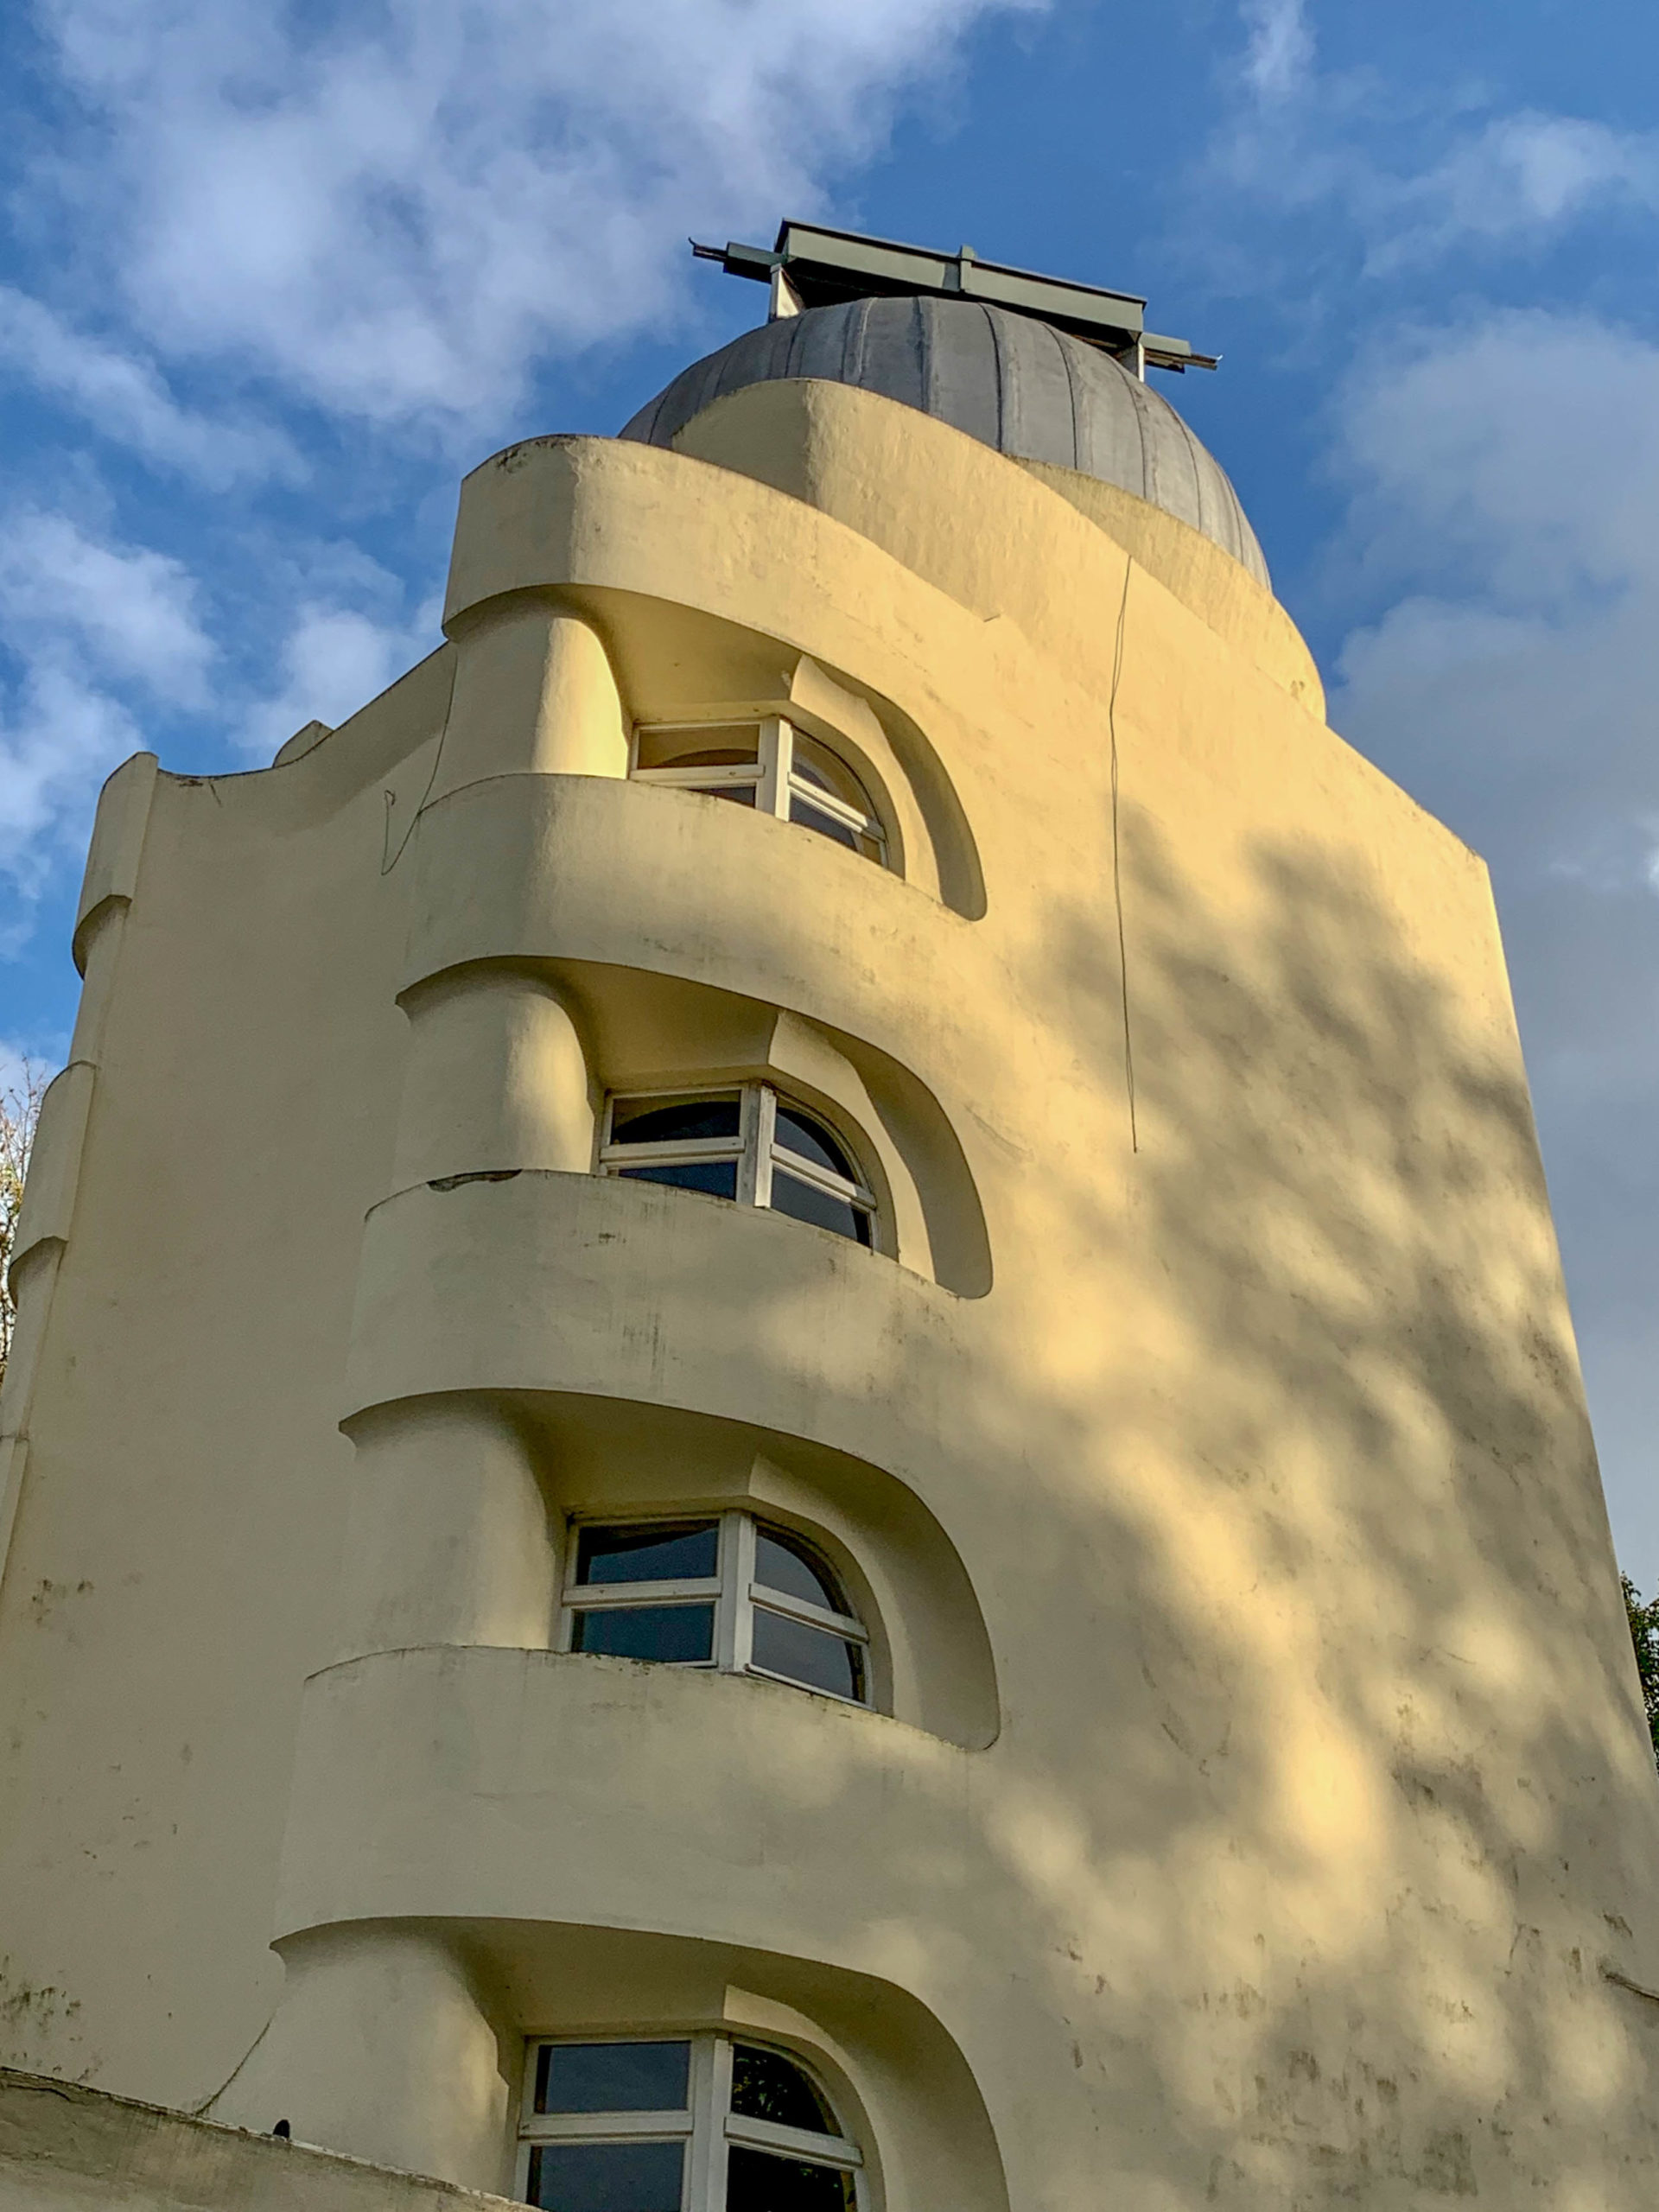 Mendelsohn Architekt